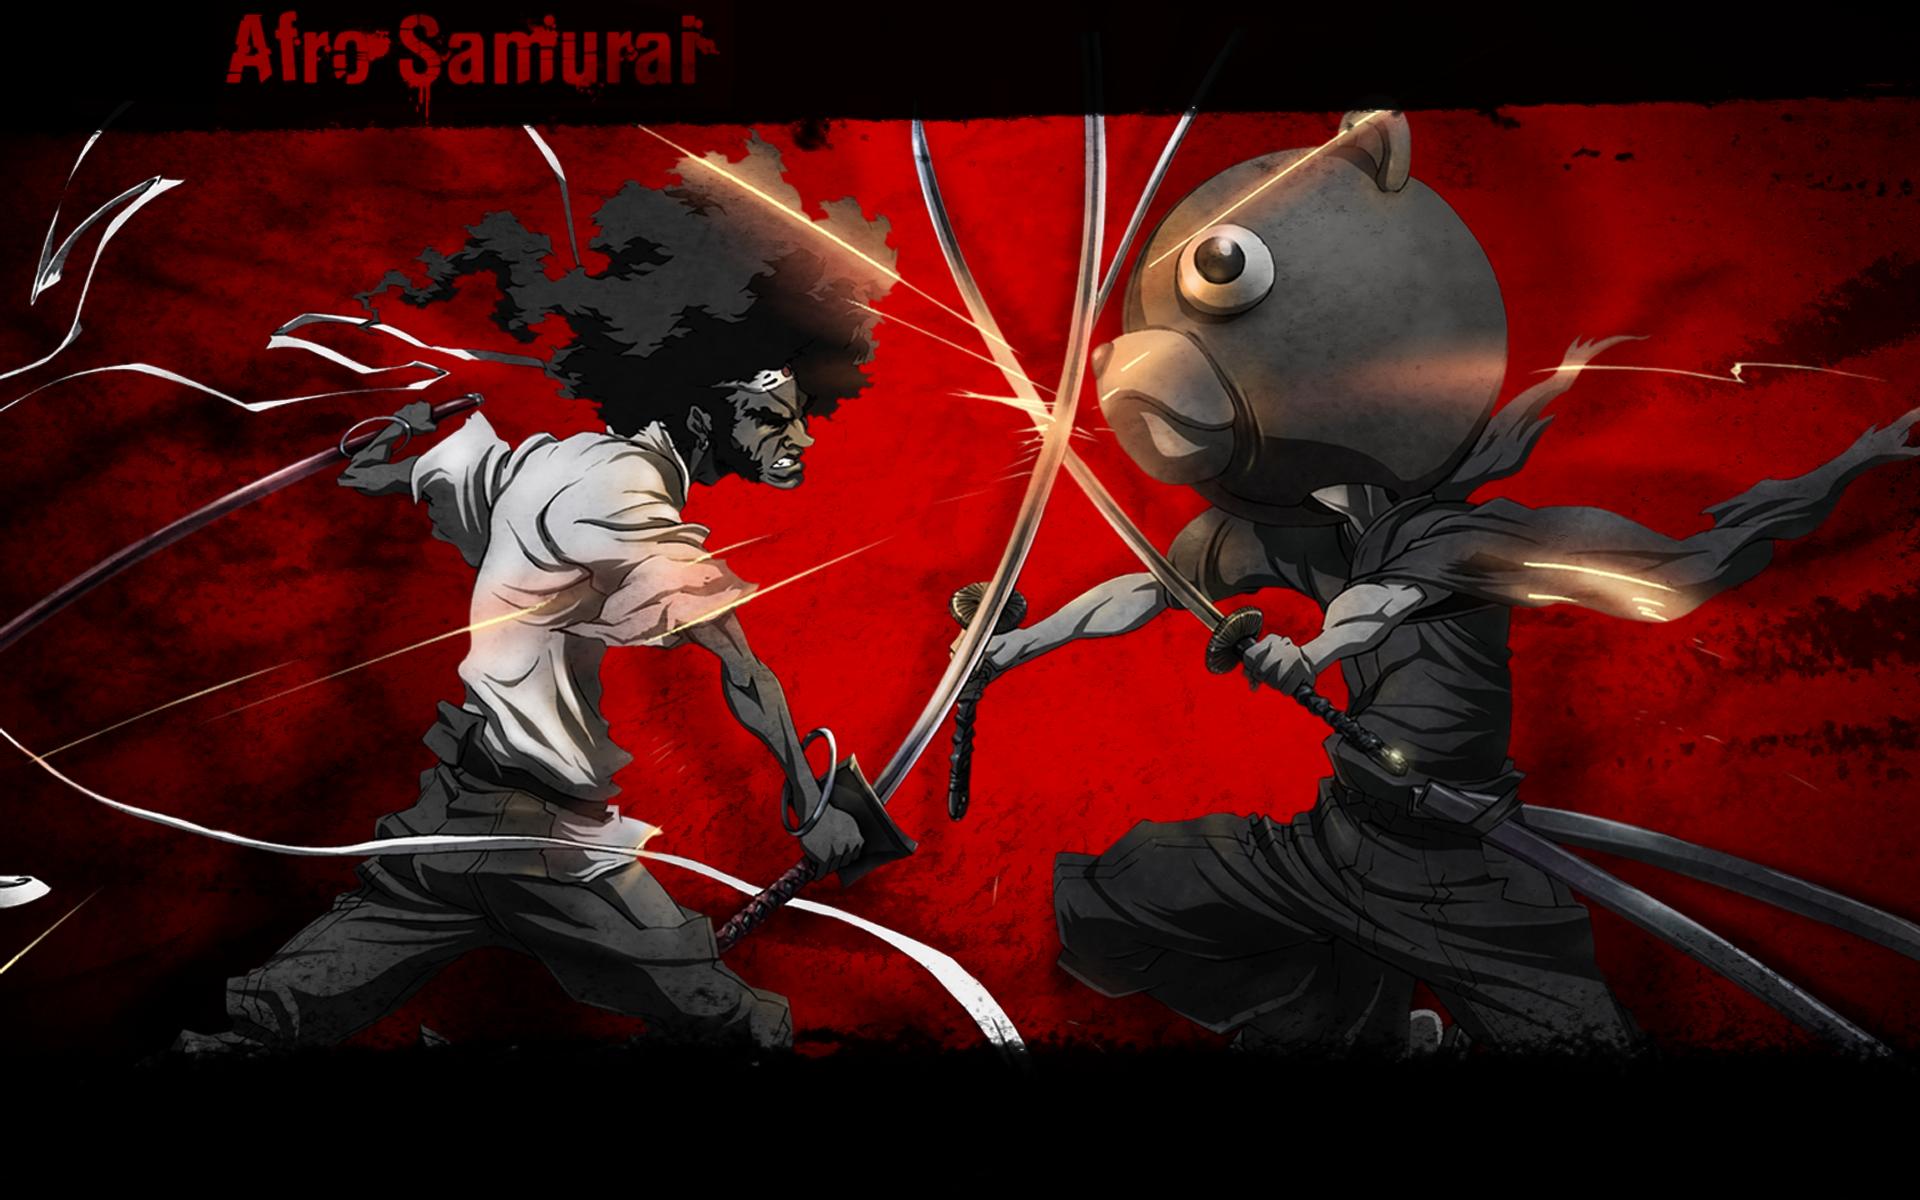 samurai wallpaper wallpapers xmdommx albums gallery 1920x1200